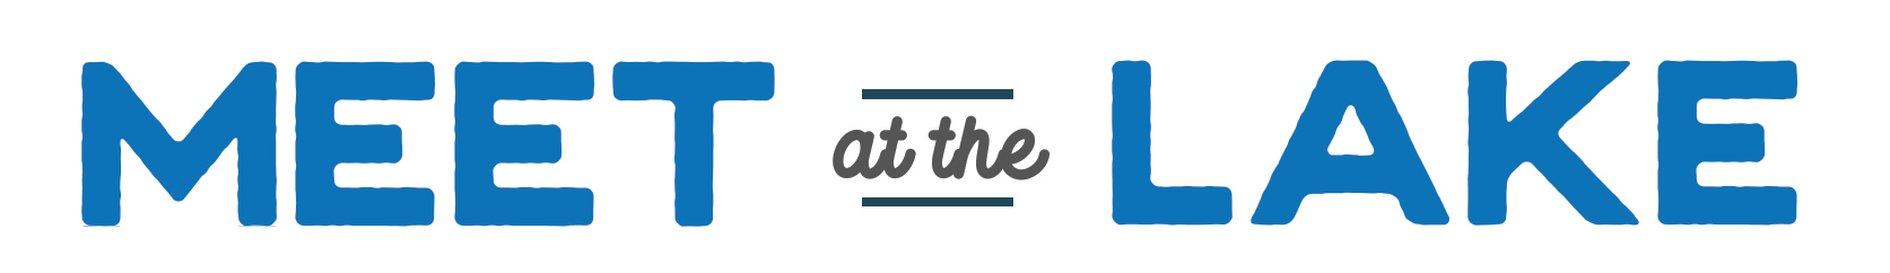 Logo for Meet at the Lake